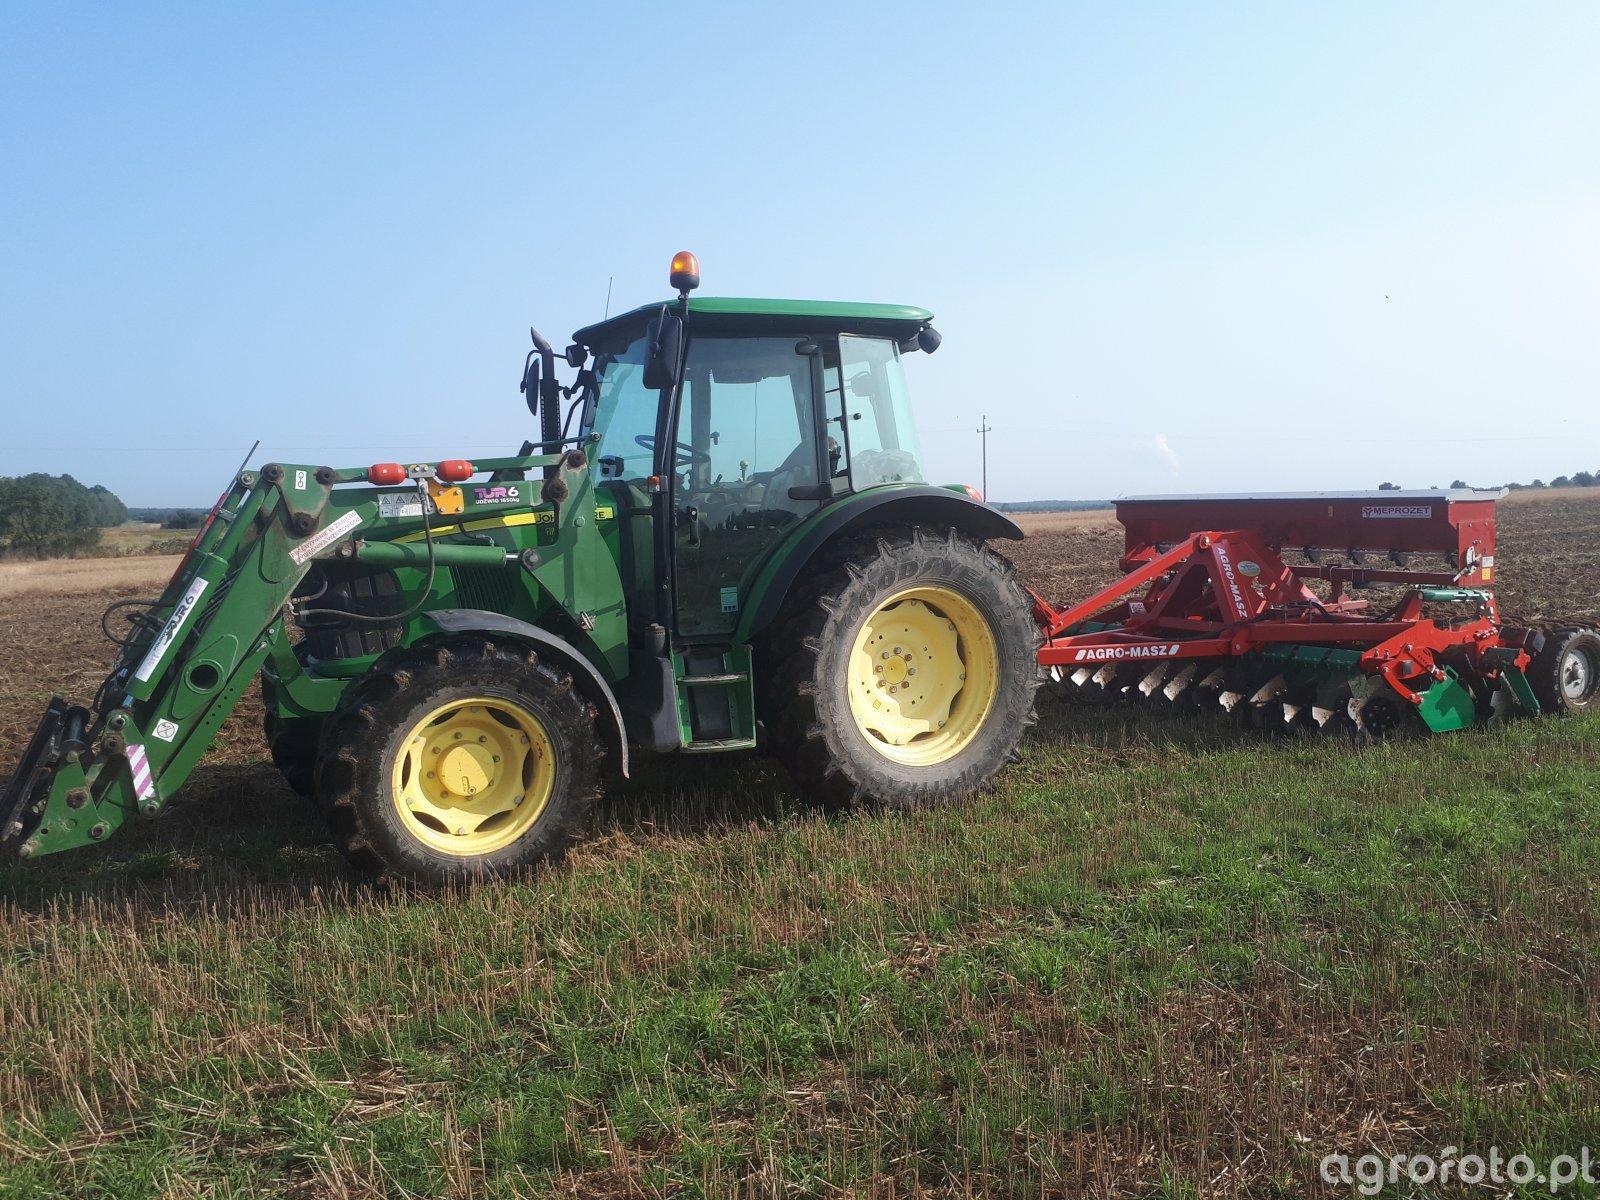 John Deere 5090M + Agro-Masz 3m drive